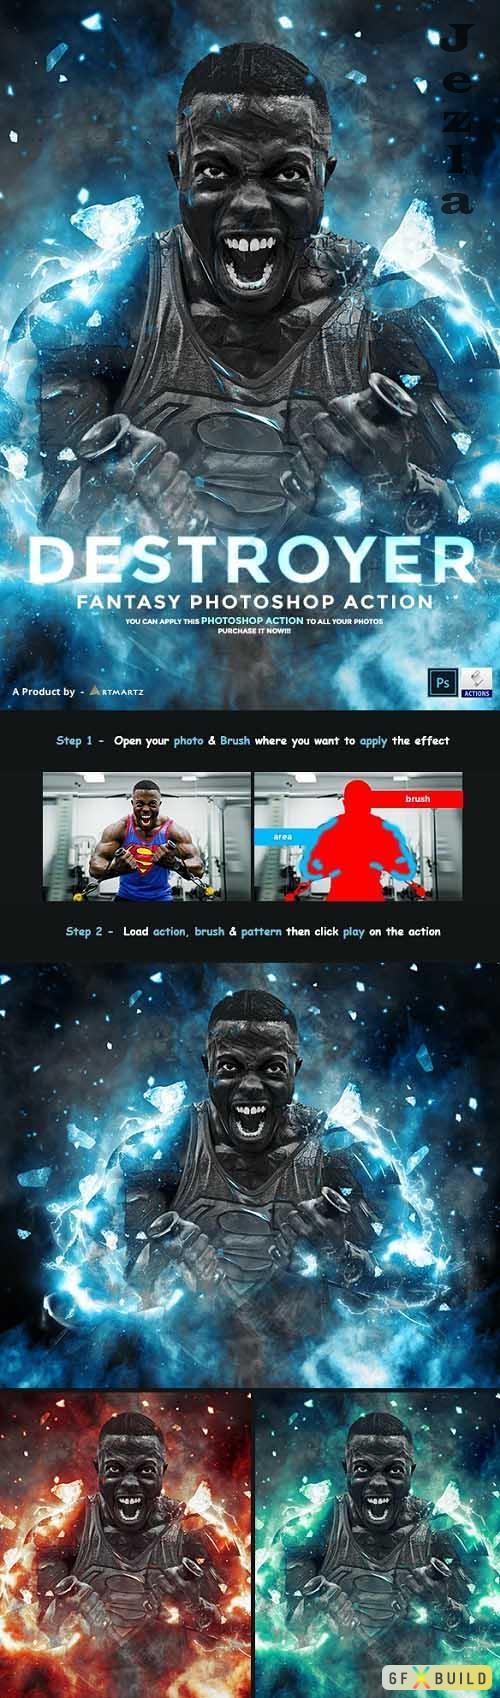 Destroyer - Fantasy Photoshop Action - 32993878